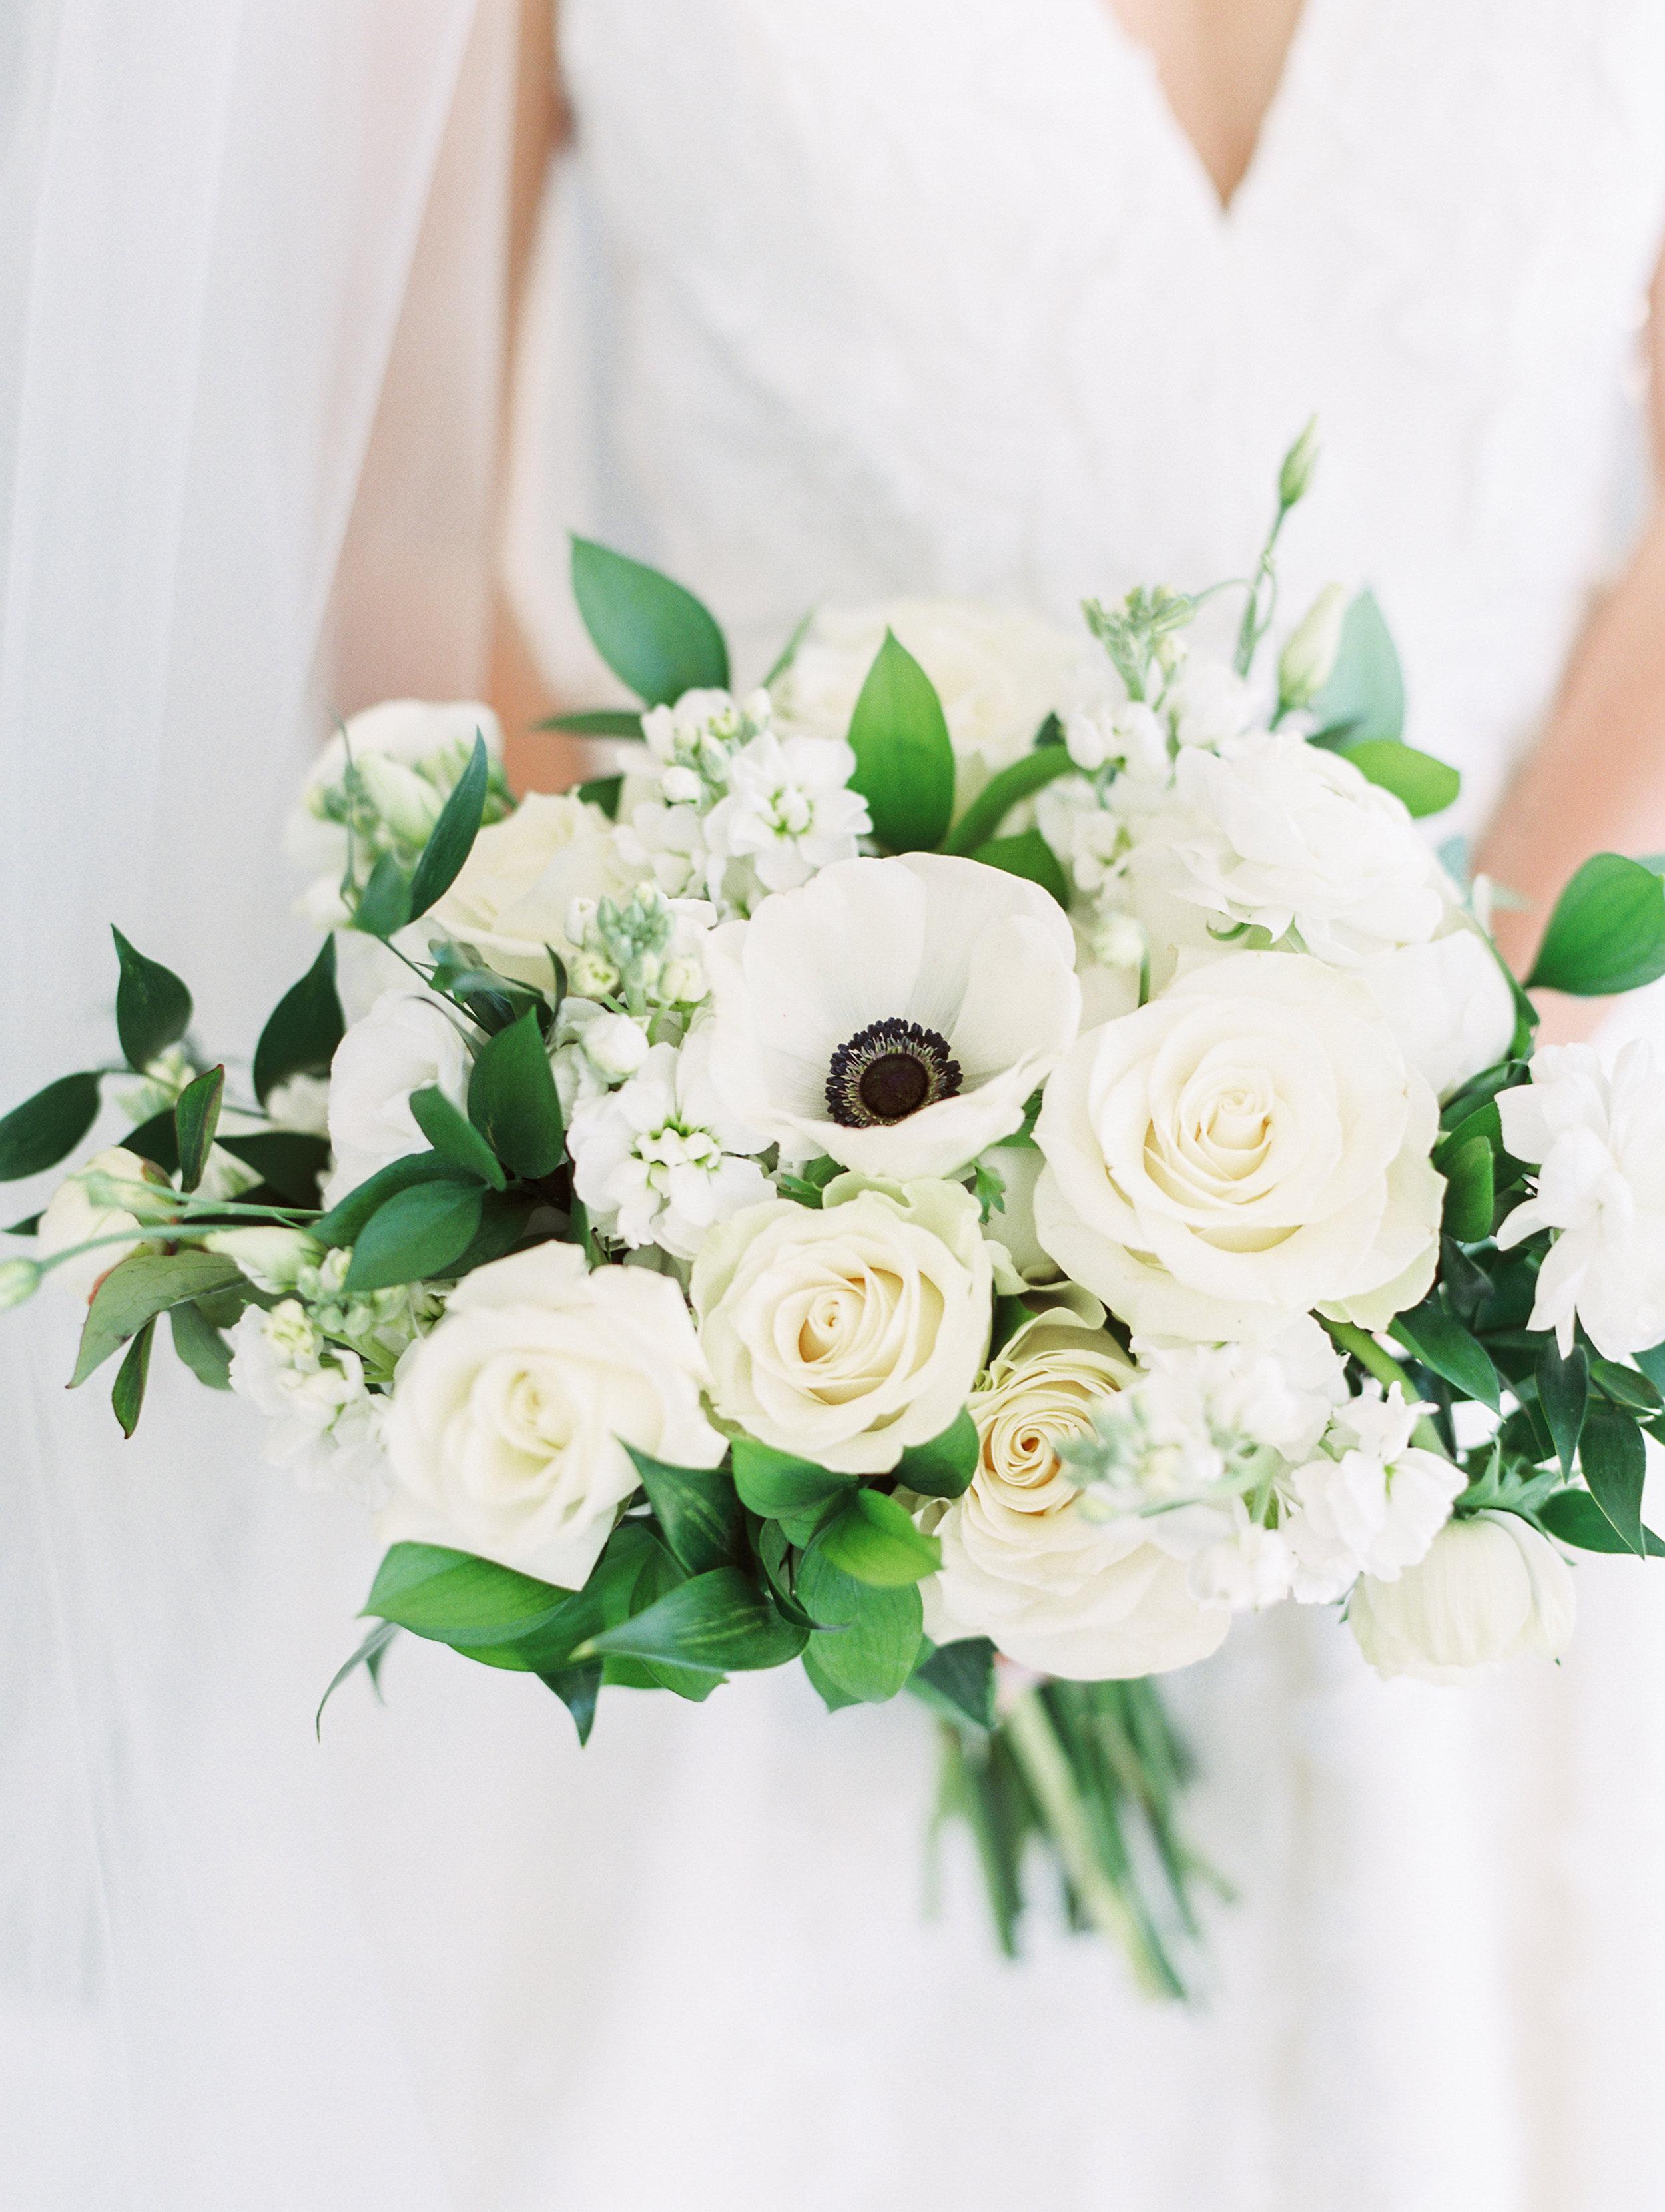 DeGuilio+Wedding+BrideGroomSunsetf-18.jpg